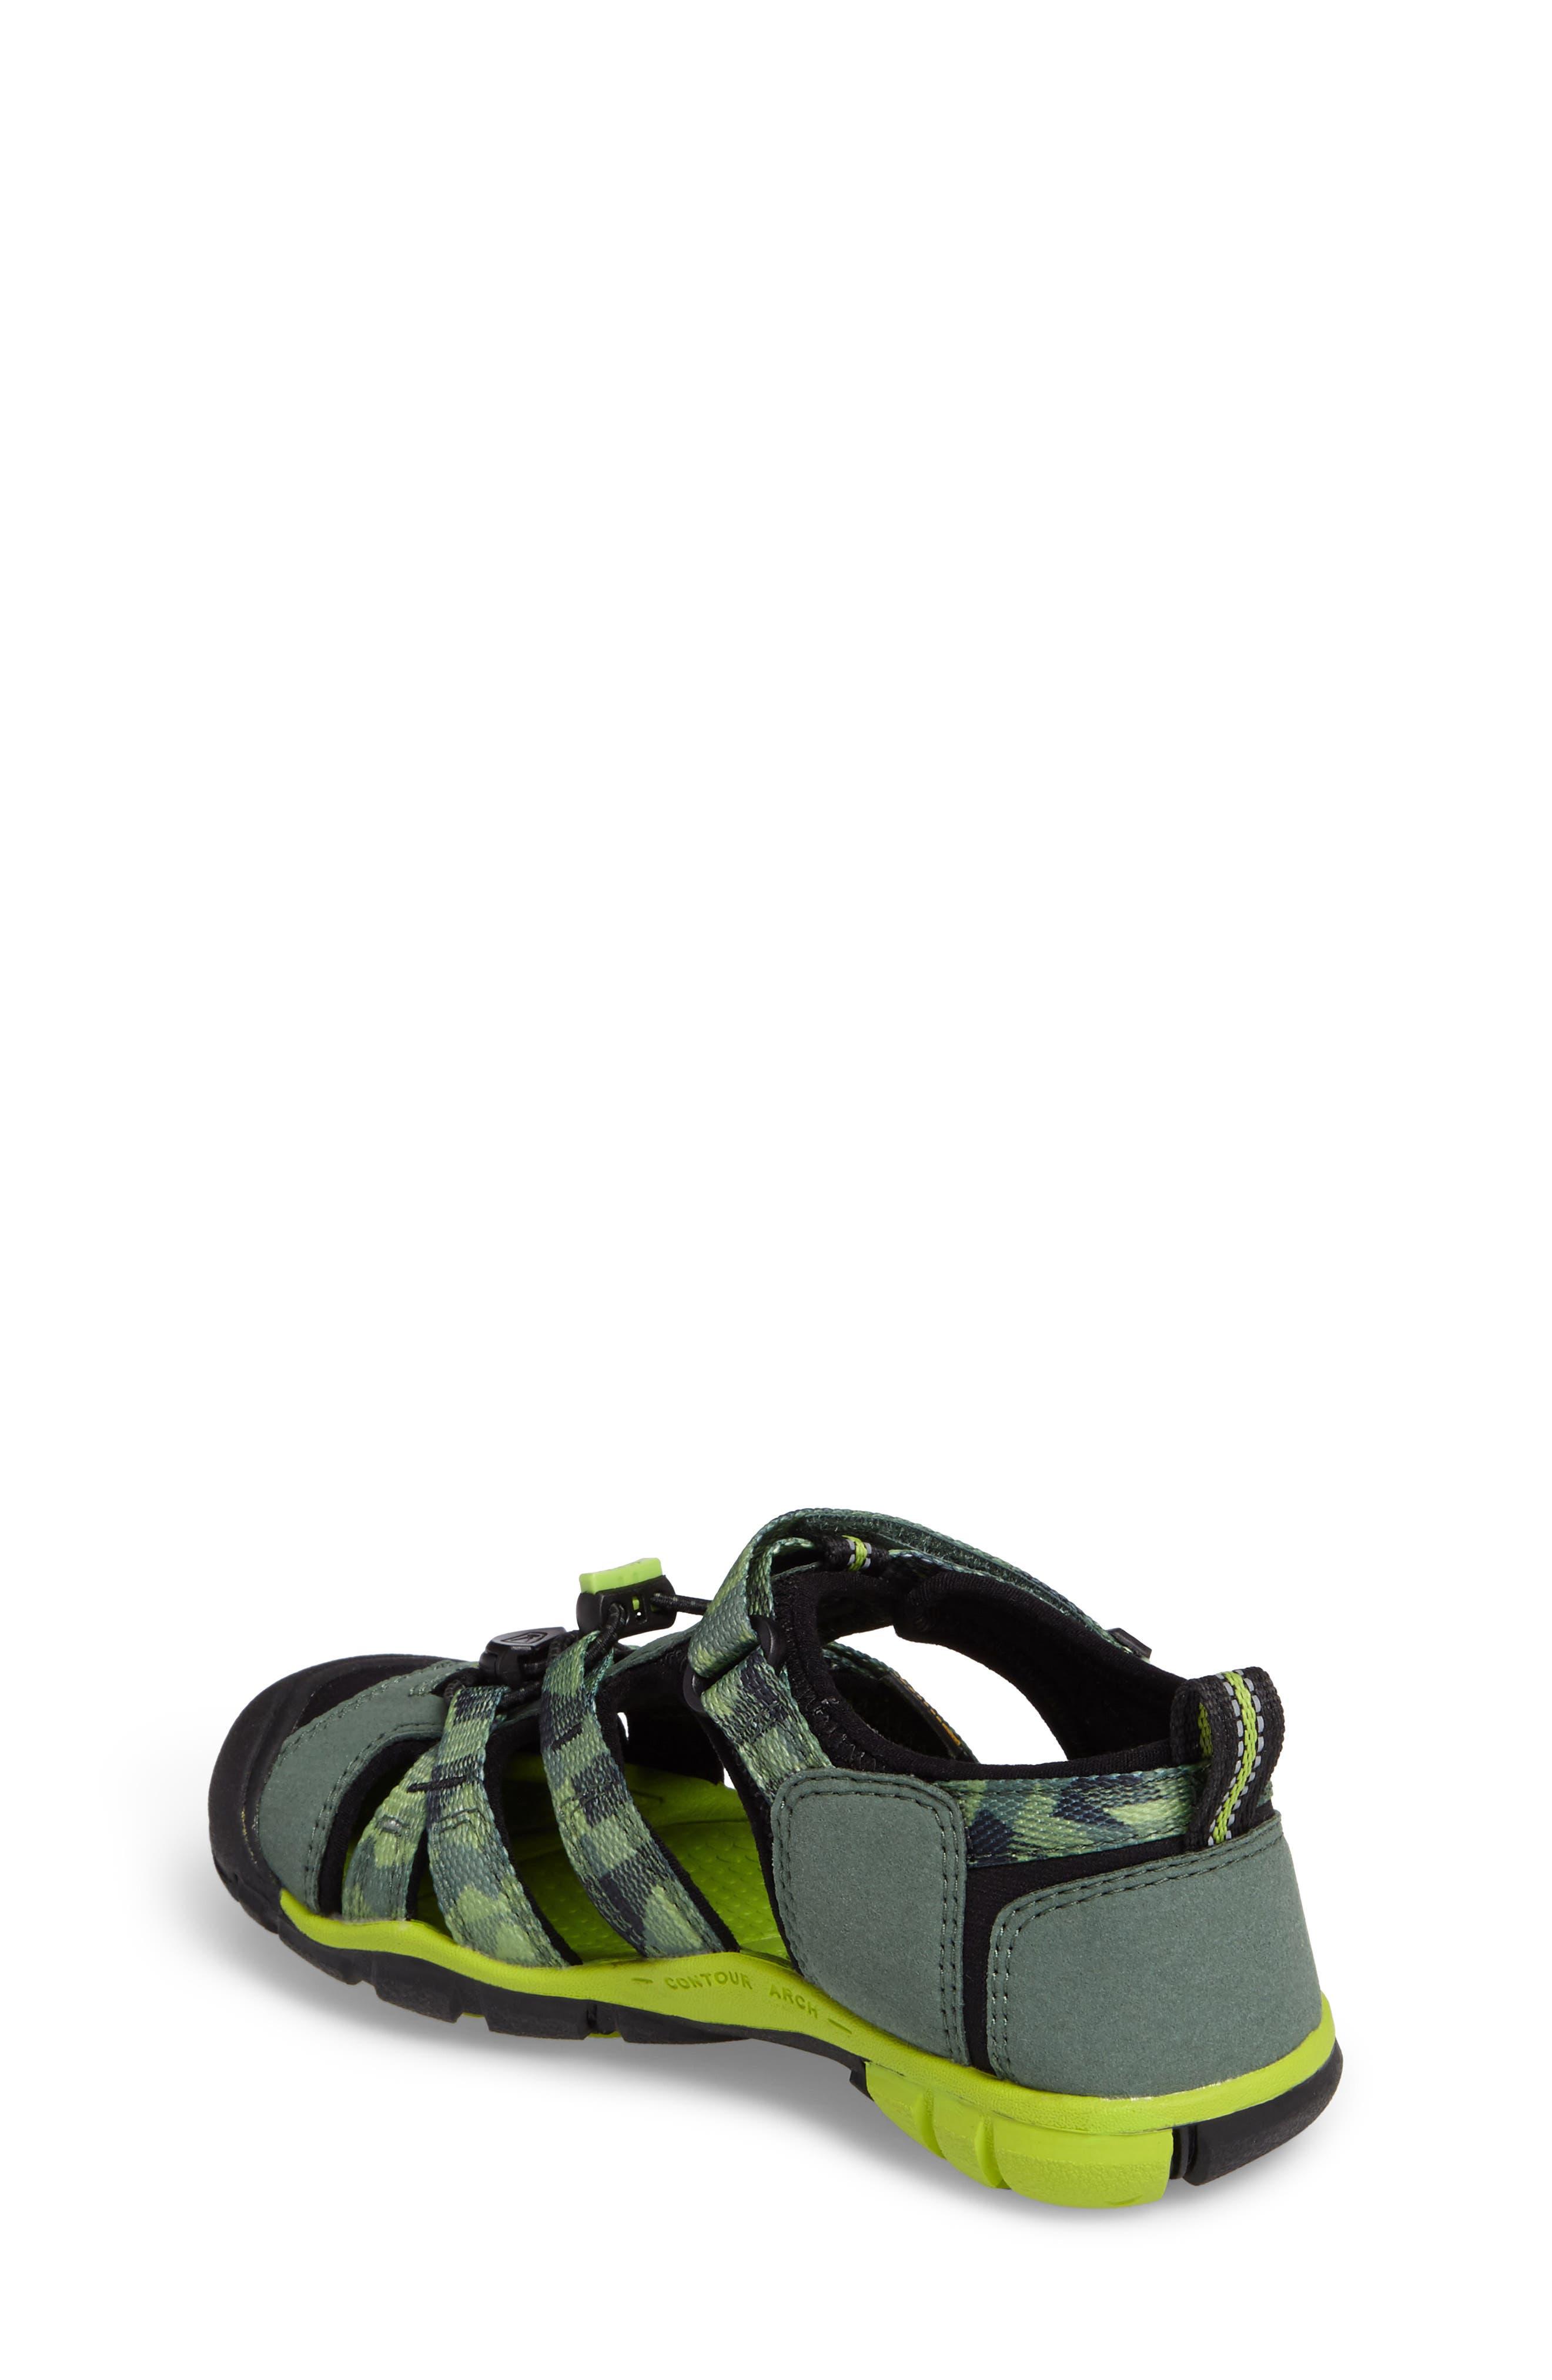 ,                             'Seacamp II' Water Friendly Sandal,                             Alternate thumbnail 134, color,                             302